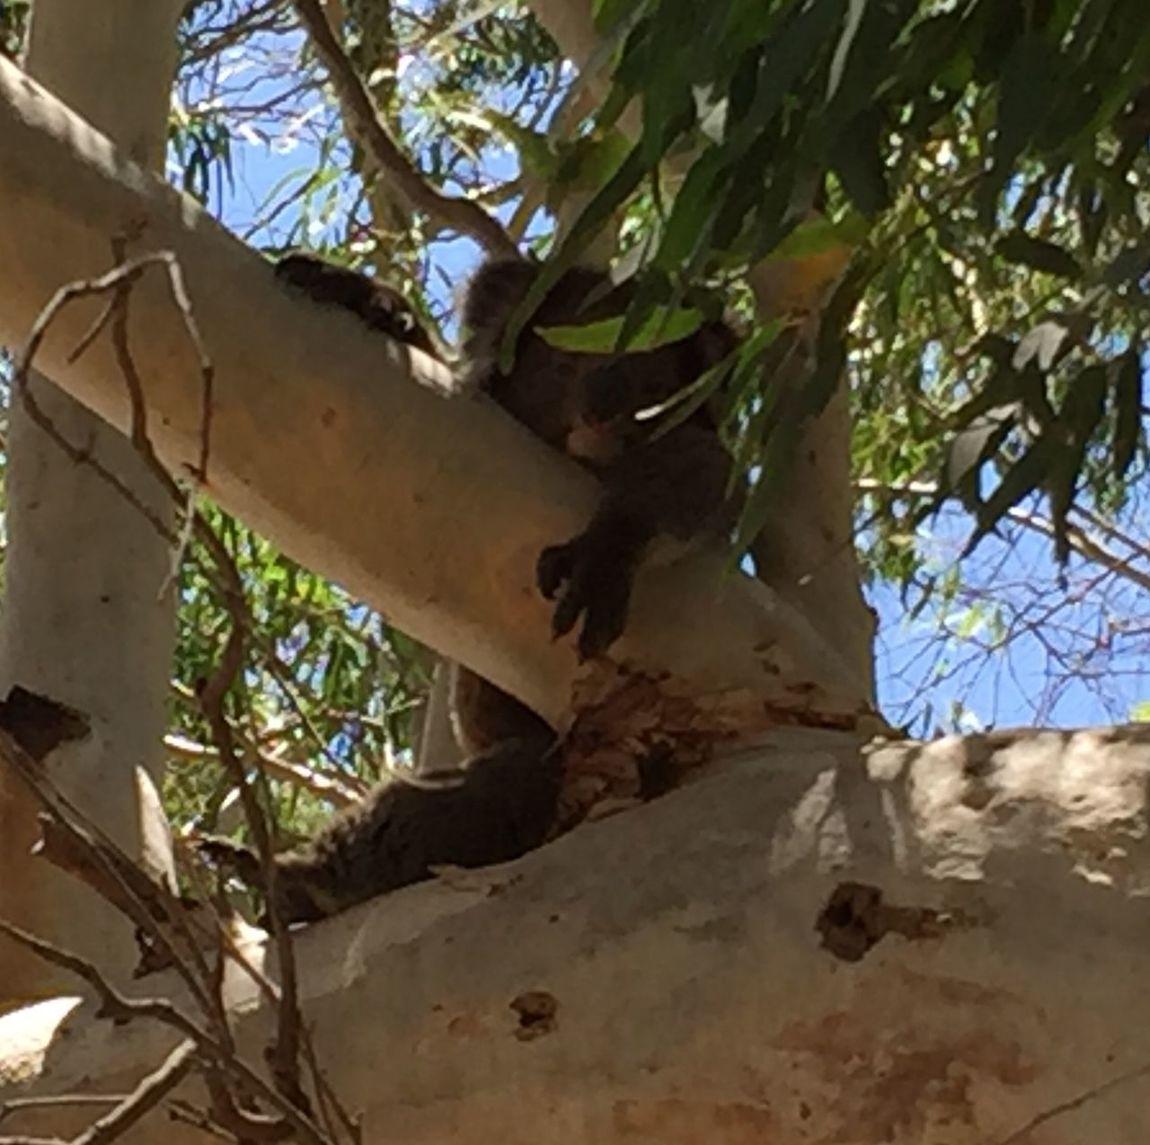 Koala Nature_collection Lazing About Hangingout Takingphotos Australia Marsupial Adelaide, South Australia Hills Morialta Falls Hiking Trail Adventures